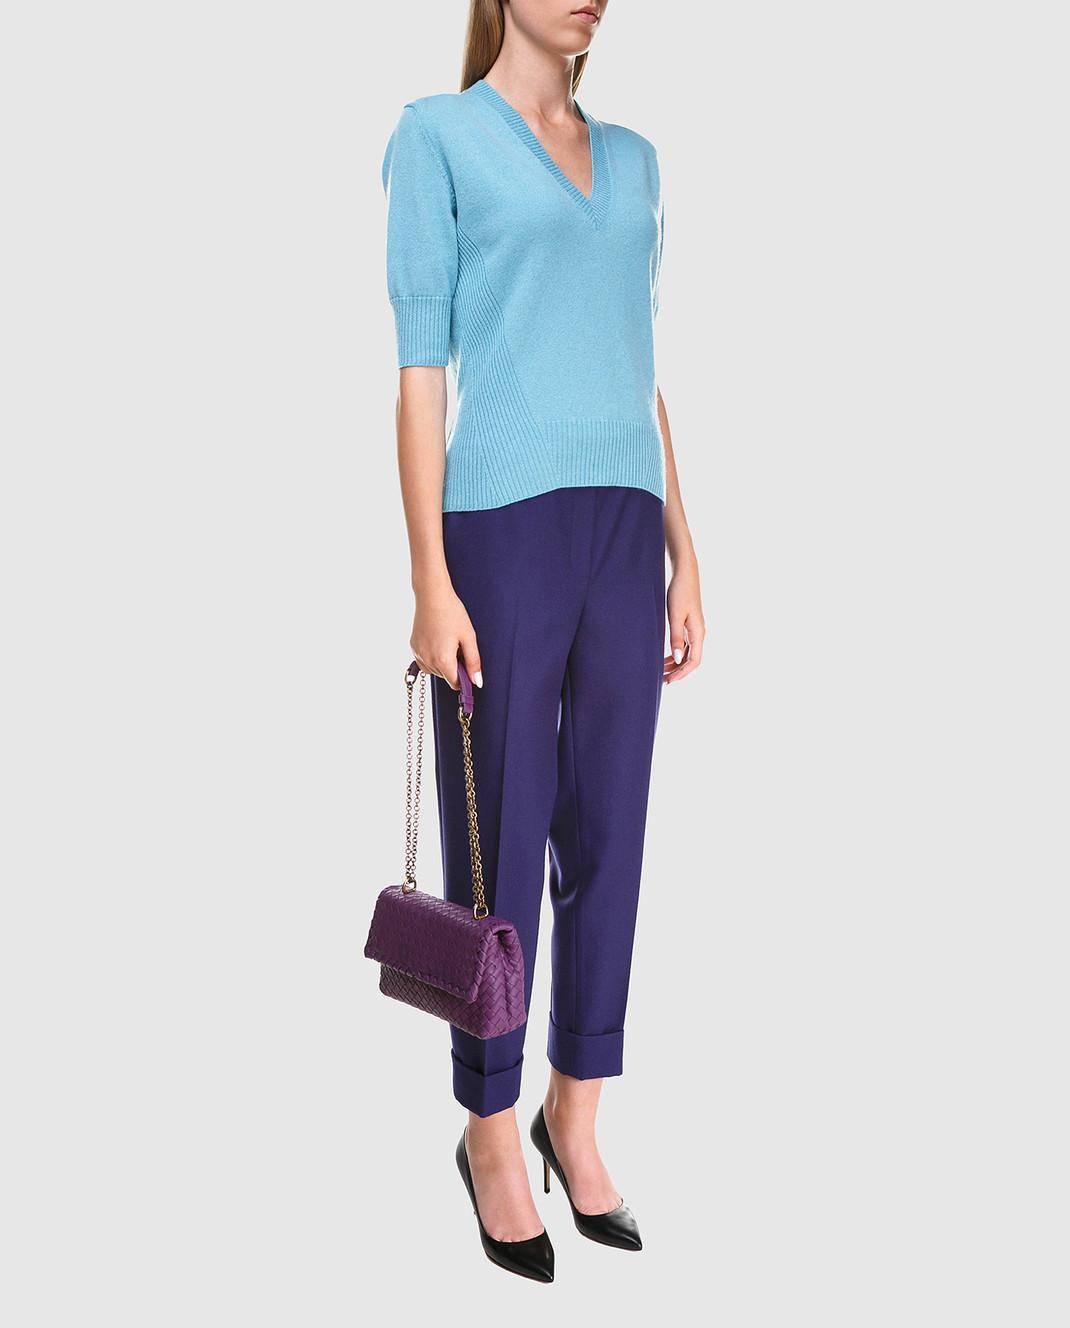 Bottega Veneta Синие брюки 513214 изображение 2